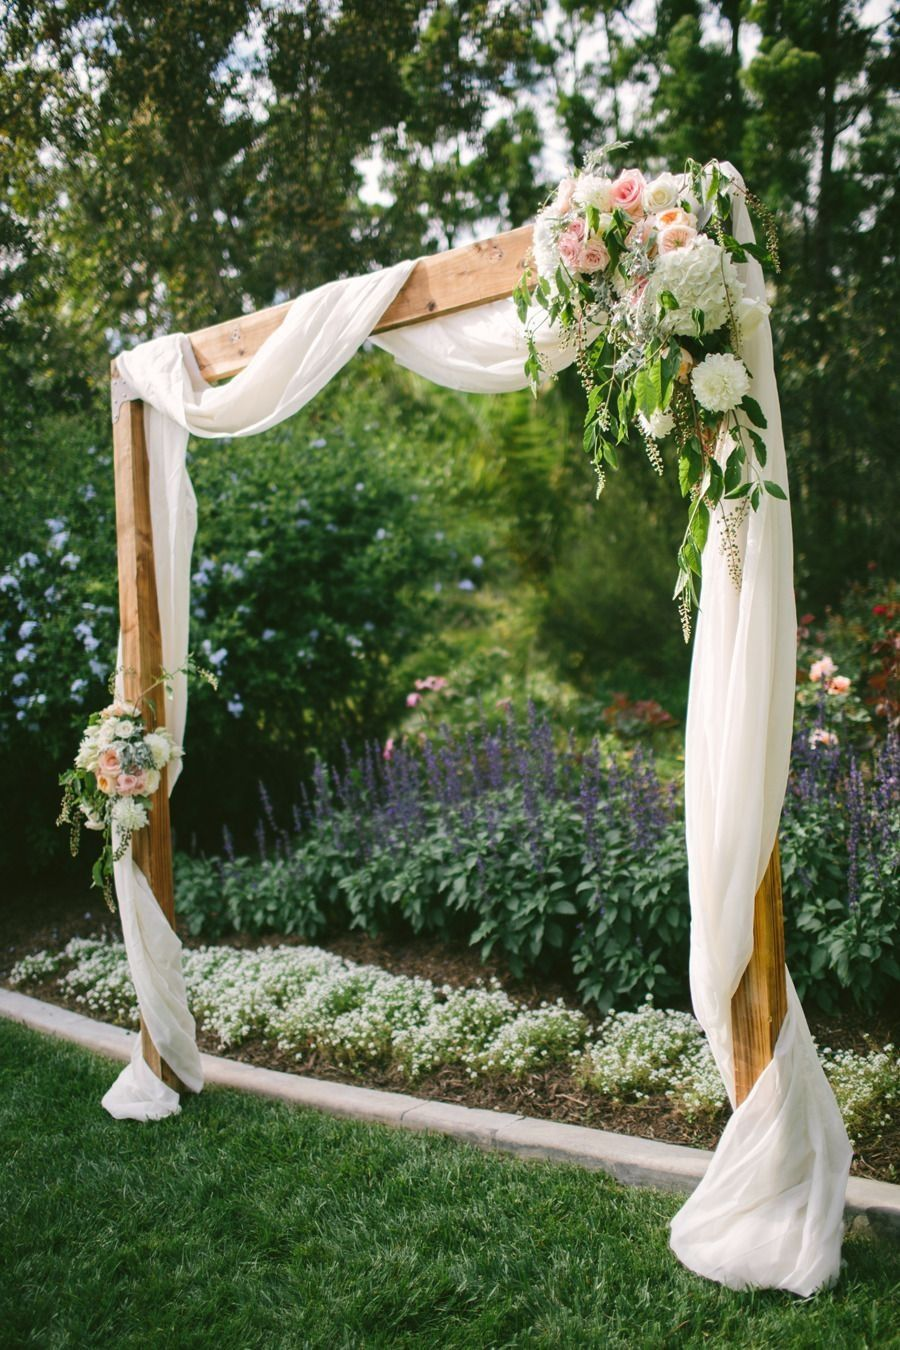 14 Backyard Wedding Decor Hacks for the